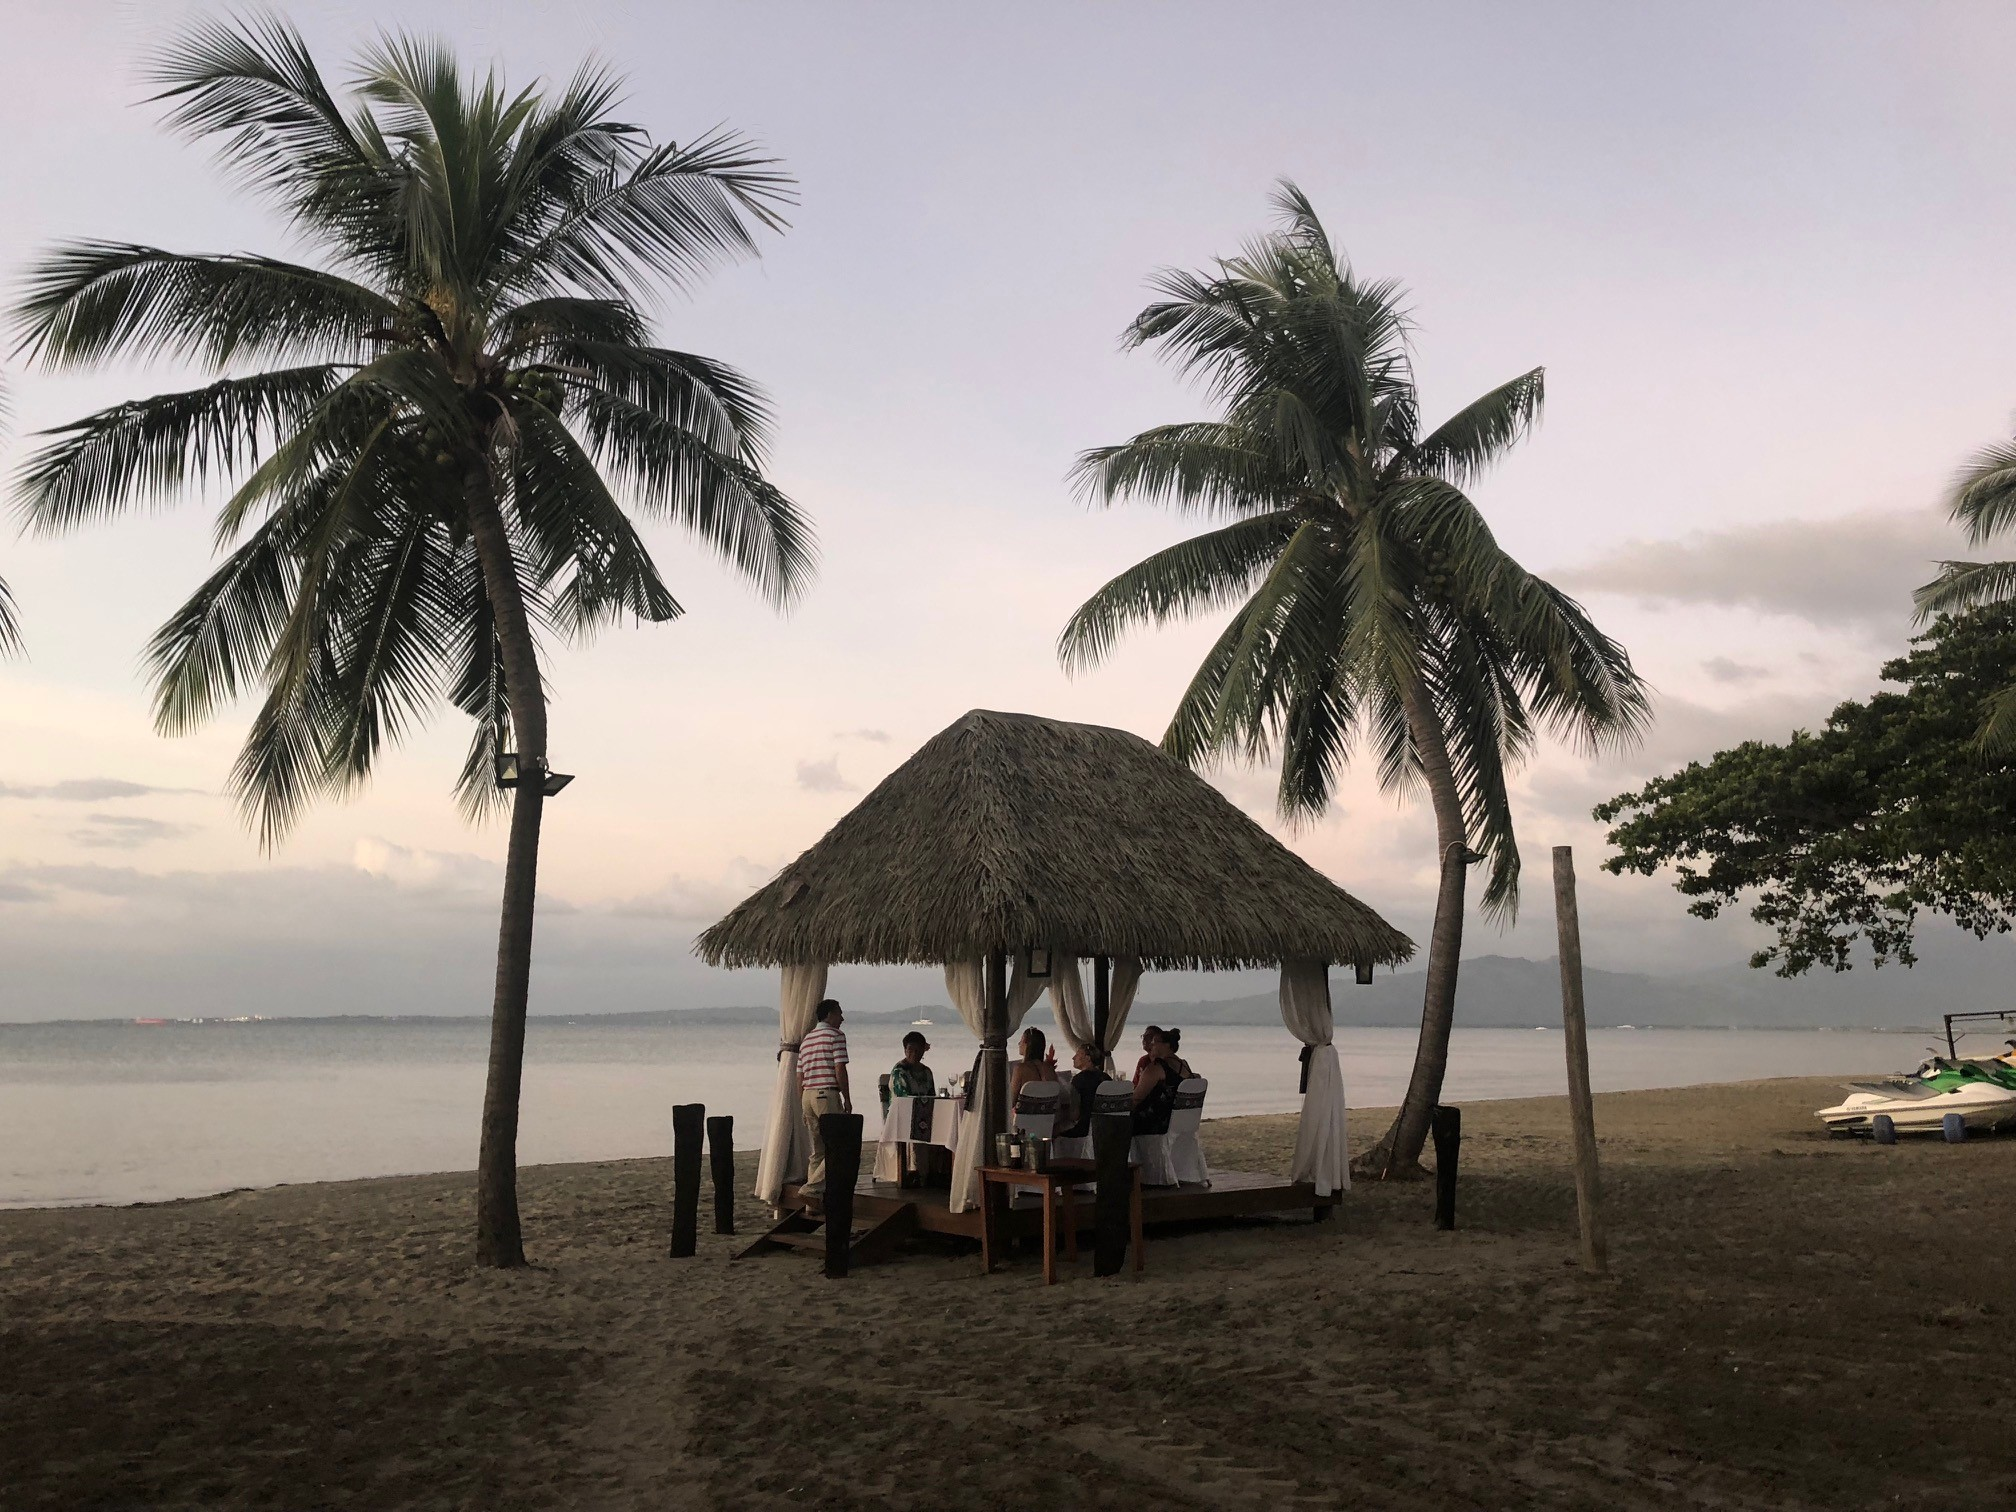 Our last night at the Sofitel Fiji